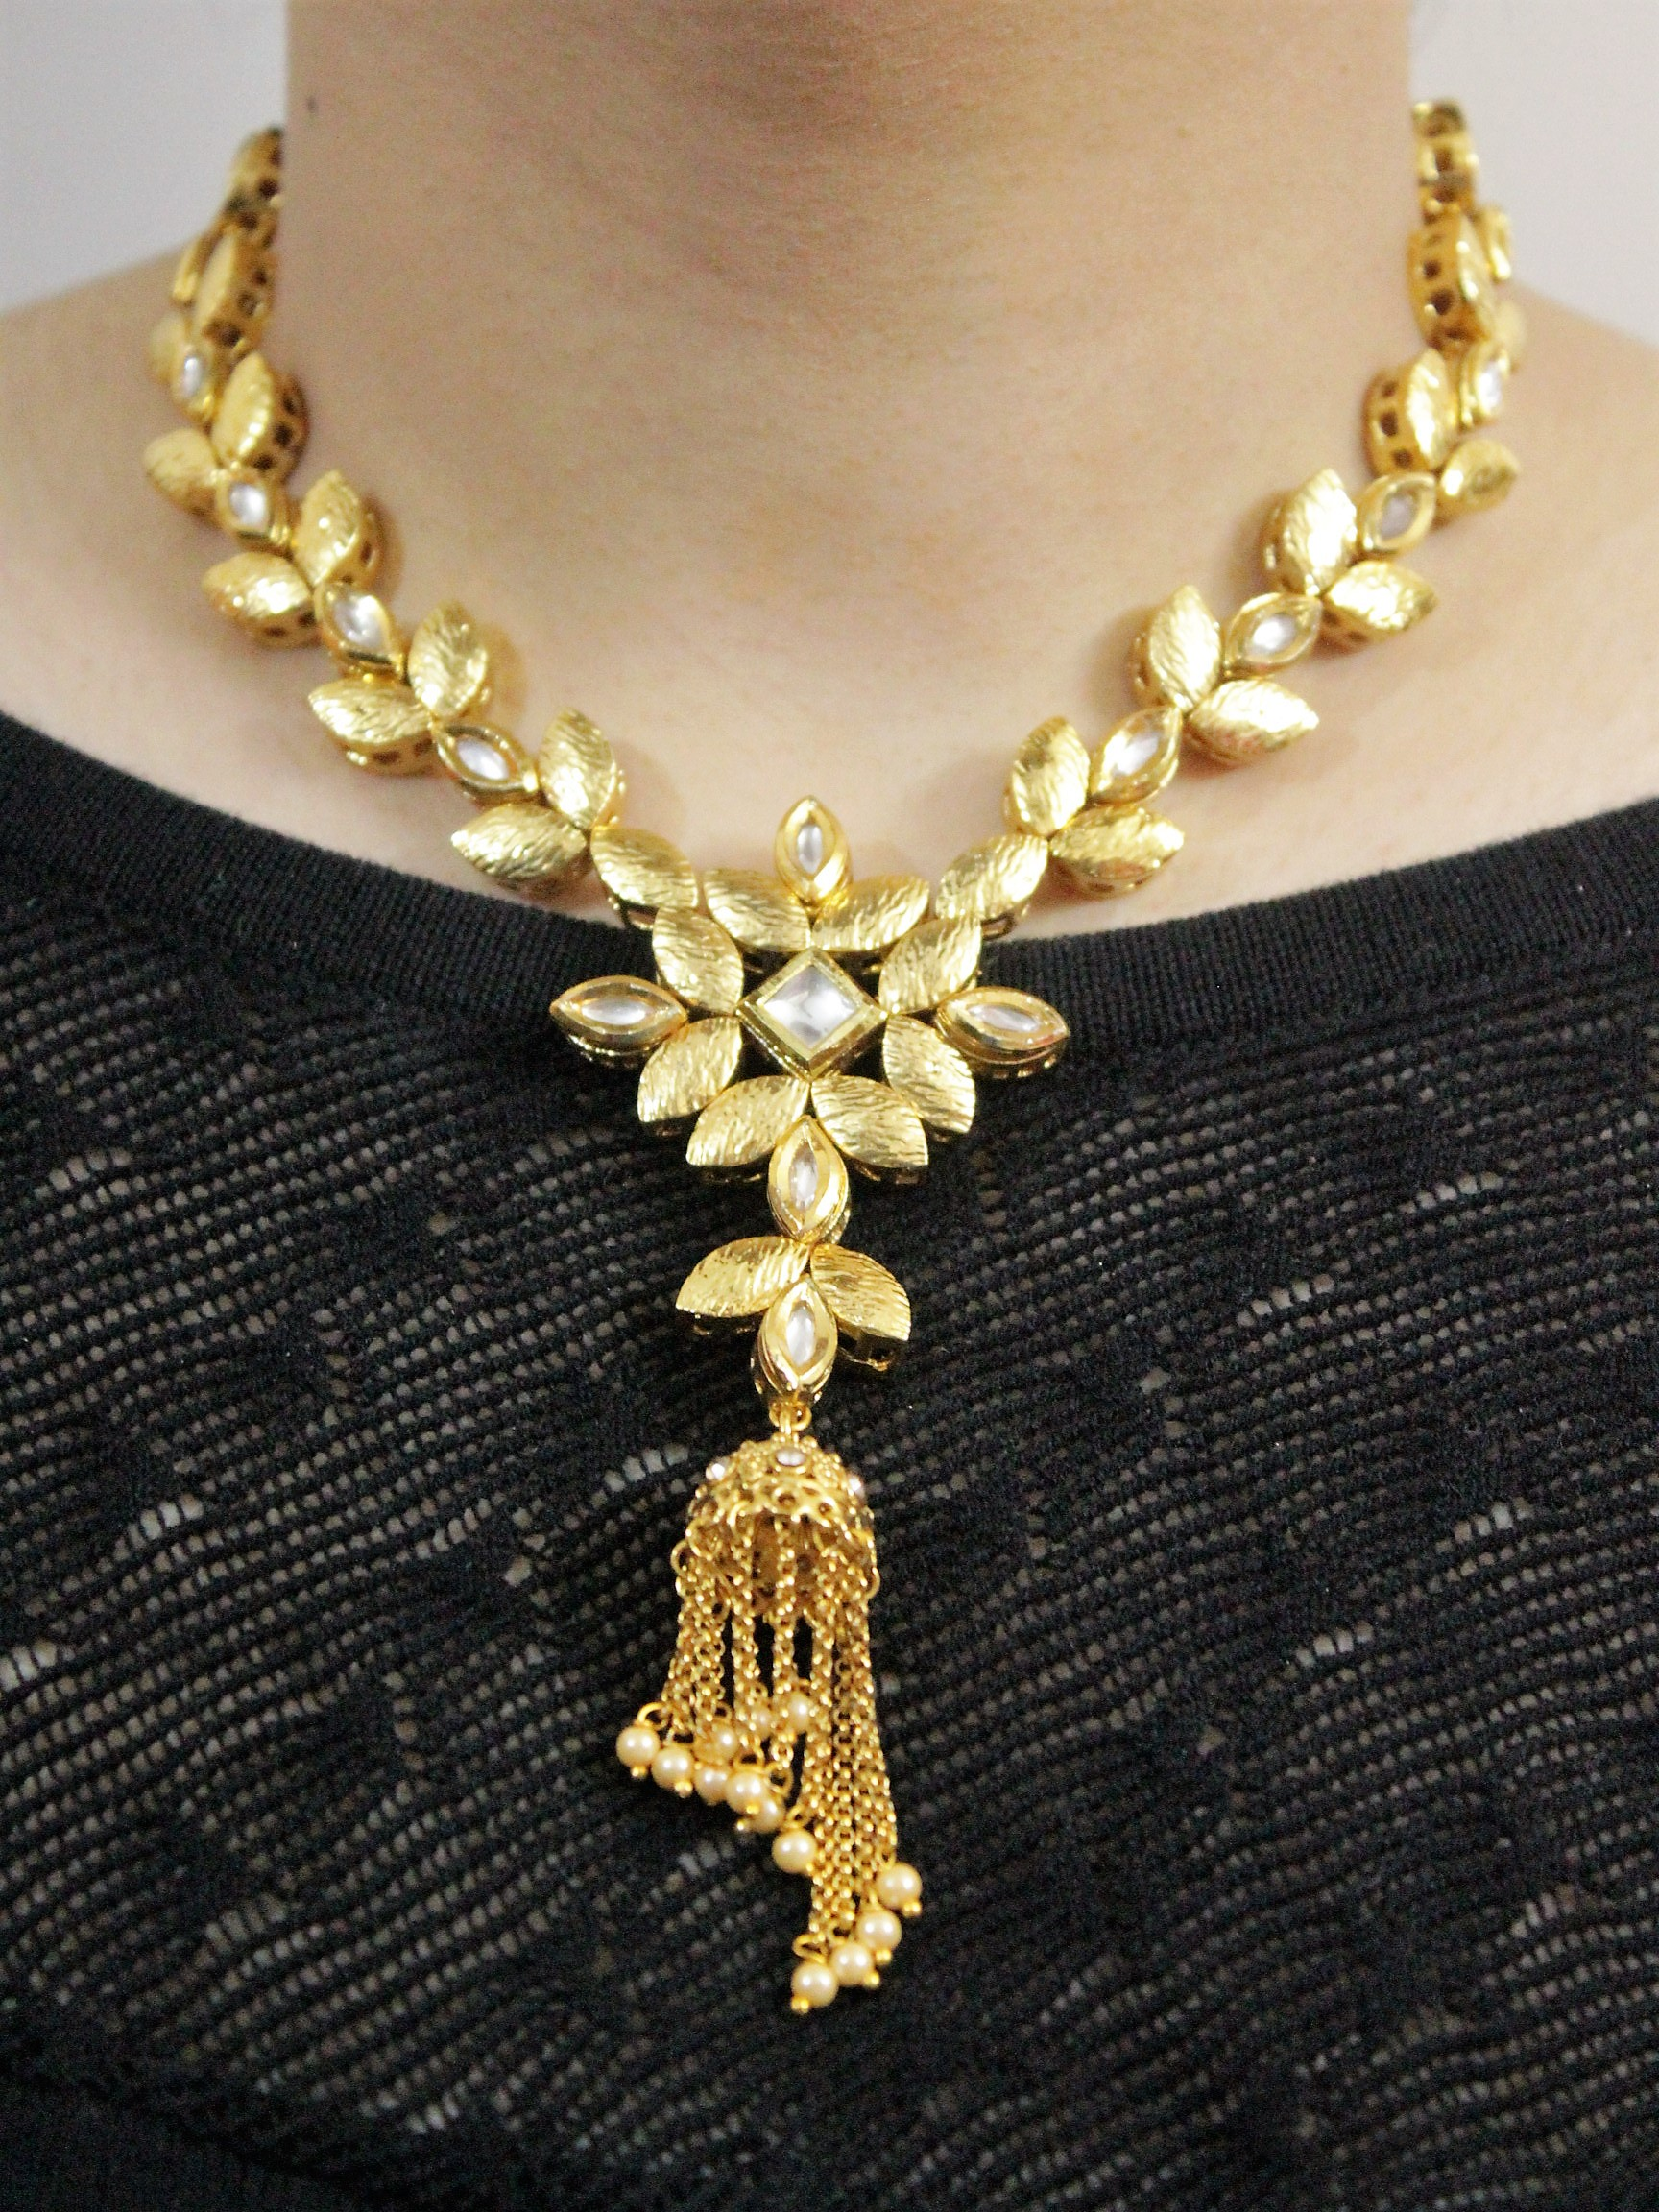 IndiHaute, karwa chauth gifts for wife india online , karwa chauth gifts for wife india on husband , karwa chauth gifts for wife india on law , karwa chauth gifts for wife india mother in law